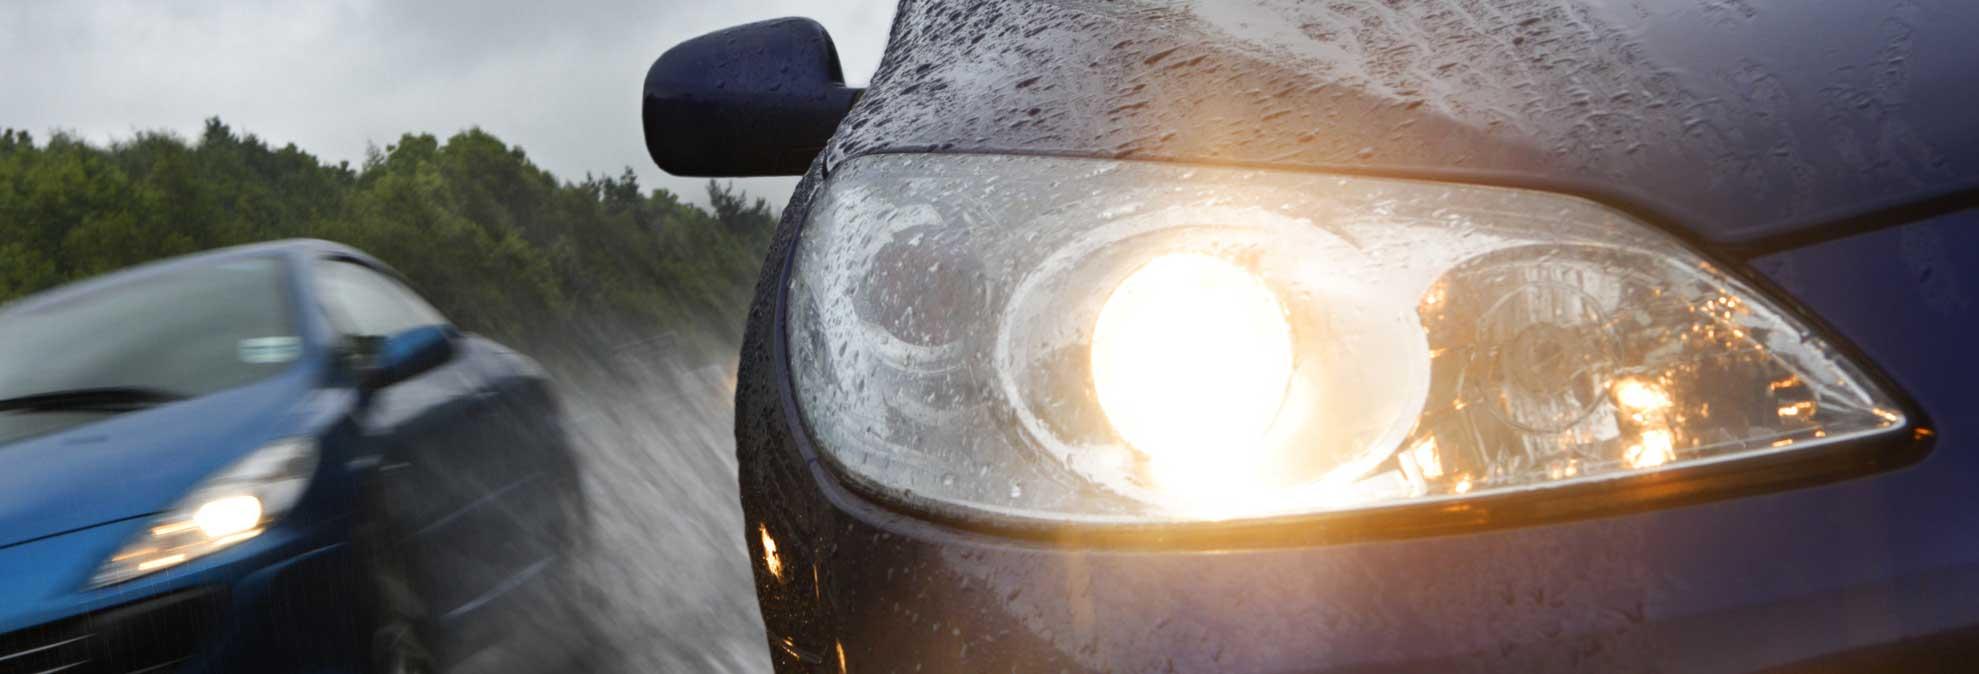 Best Headlight Restoration Kit Buying Guide - Consumer Reports